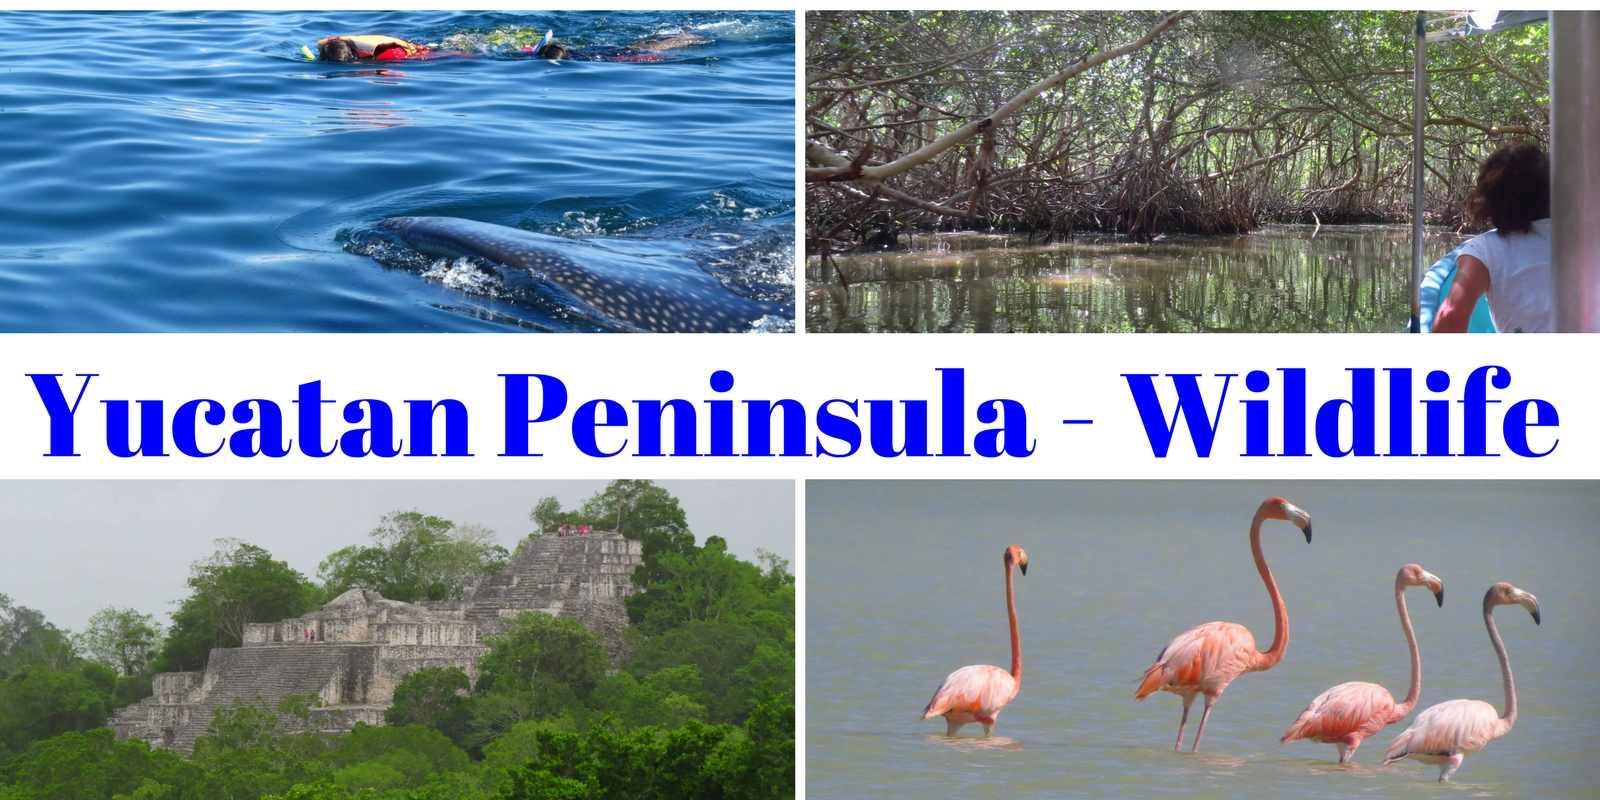 Yucatan Peninsula – Wildlife